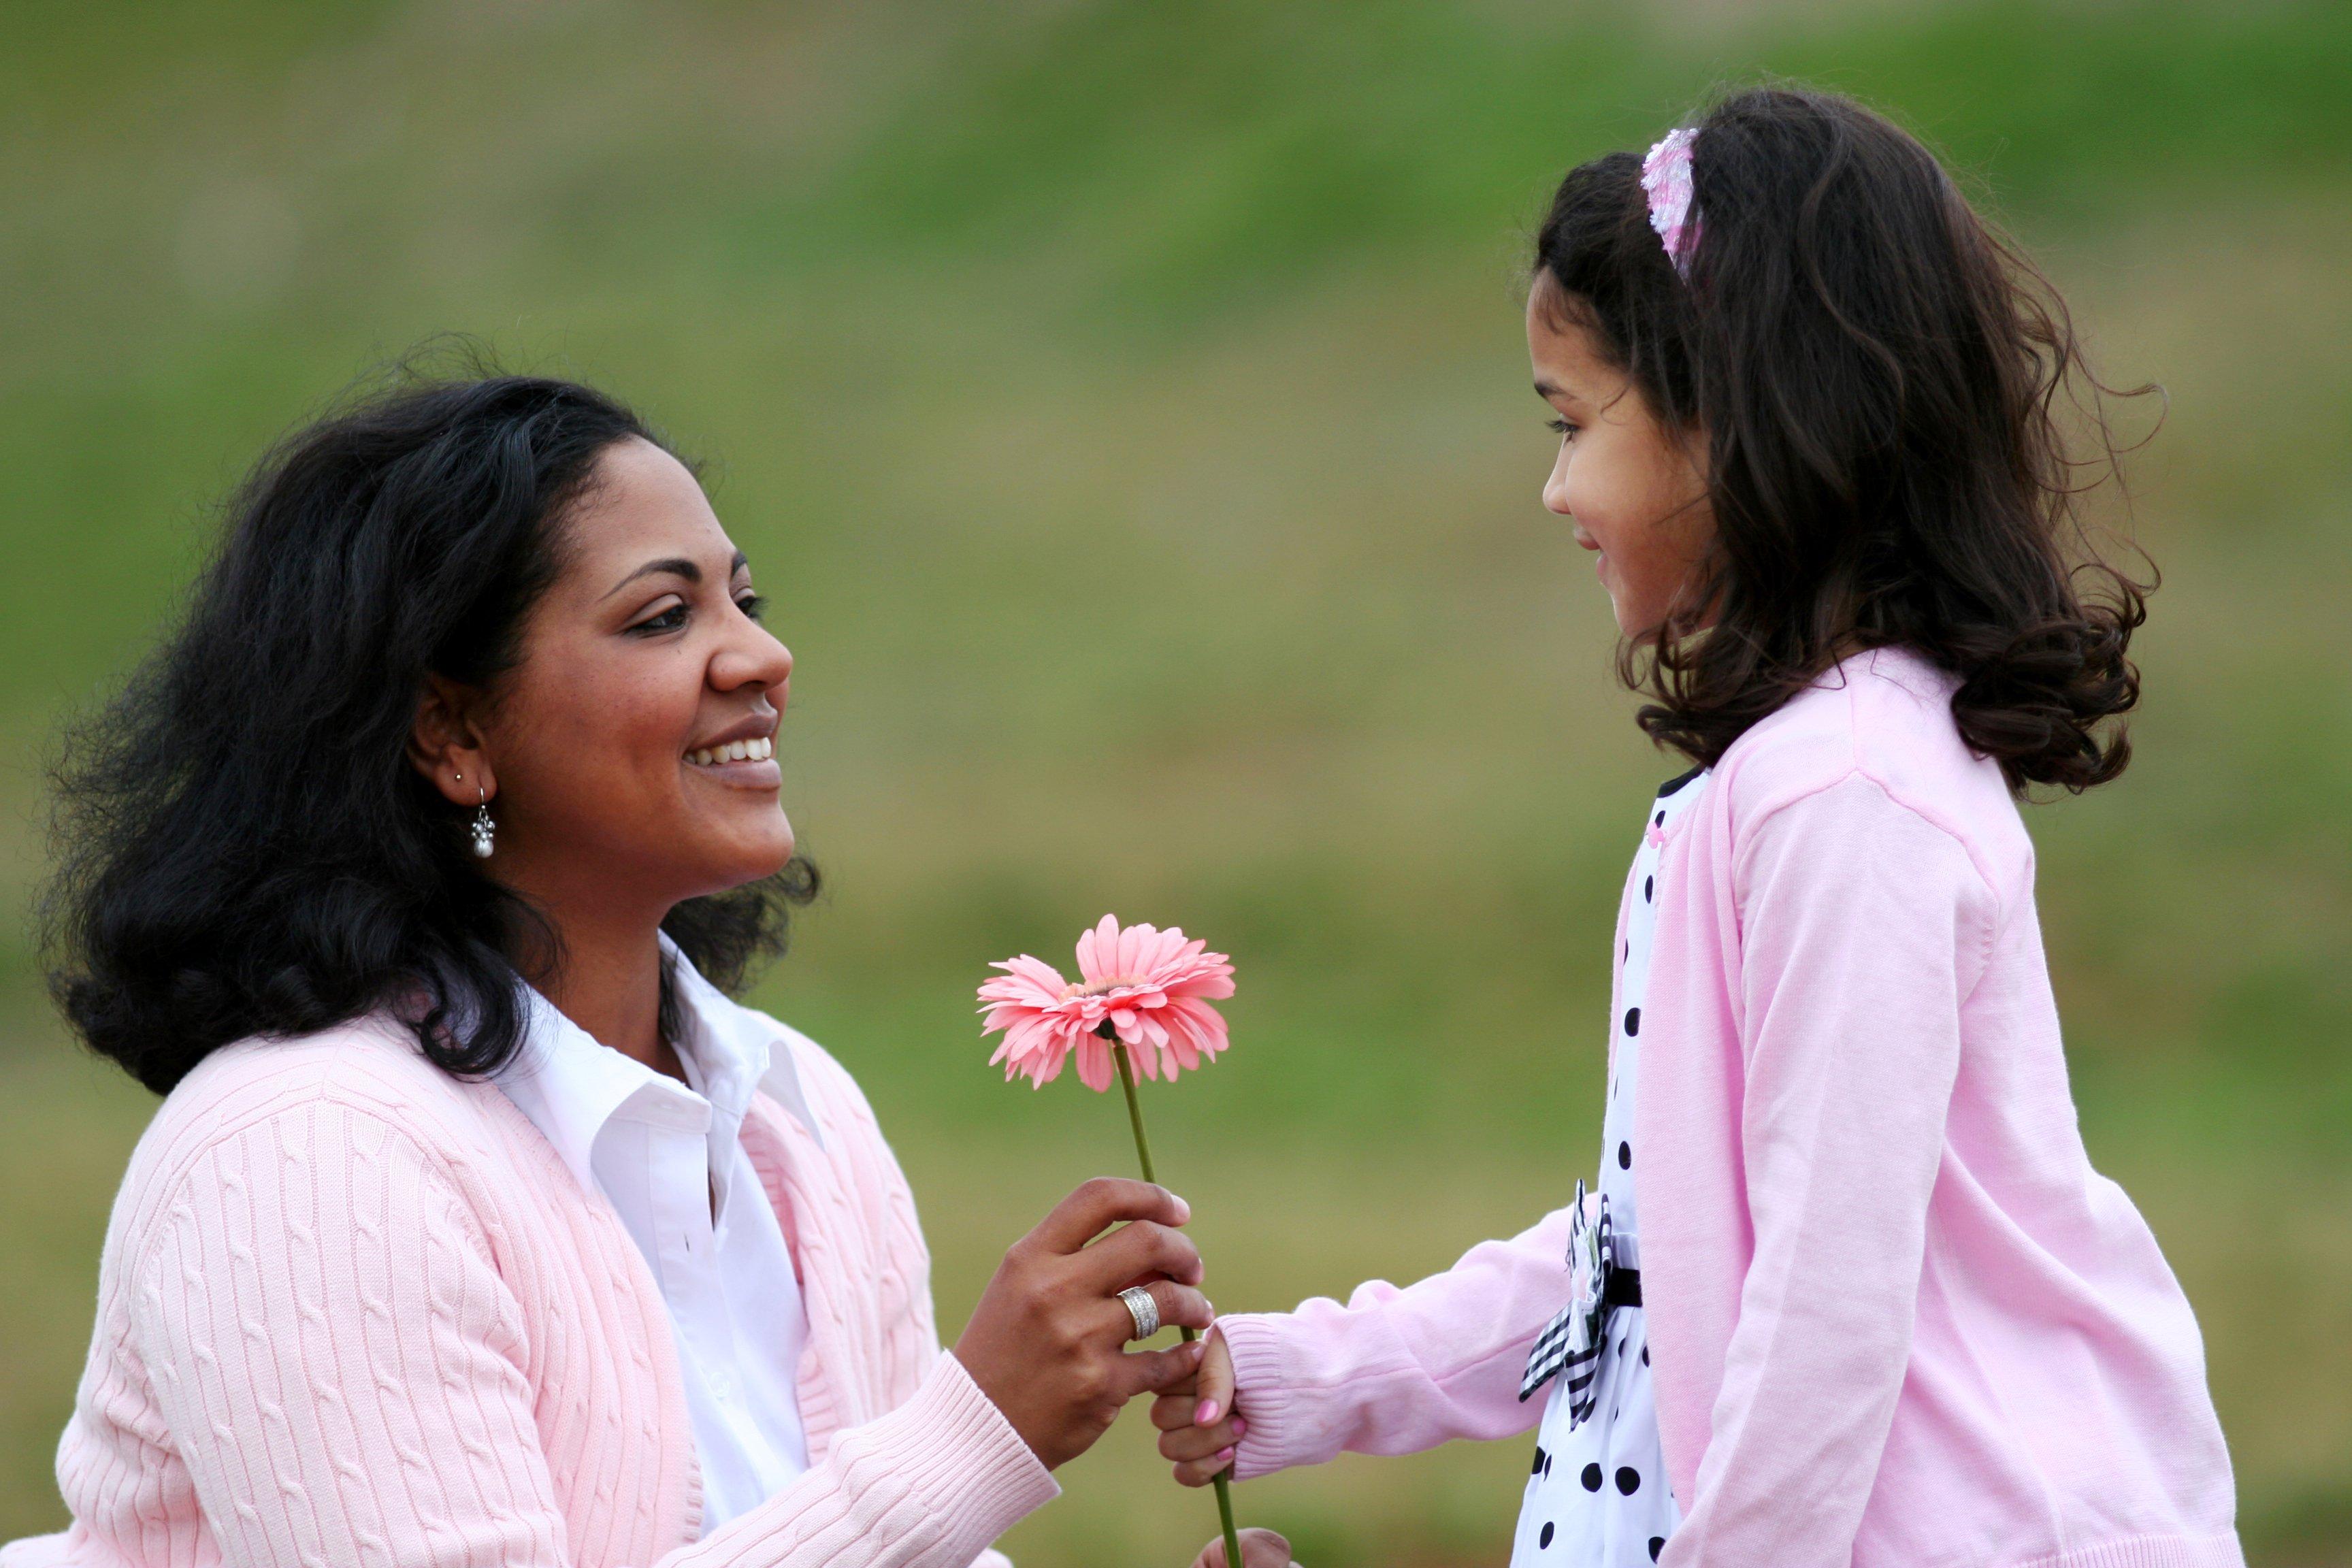 4 Benefits of An Attitude of Gratitude